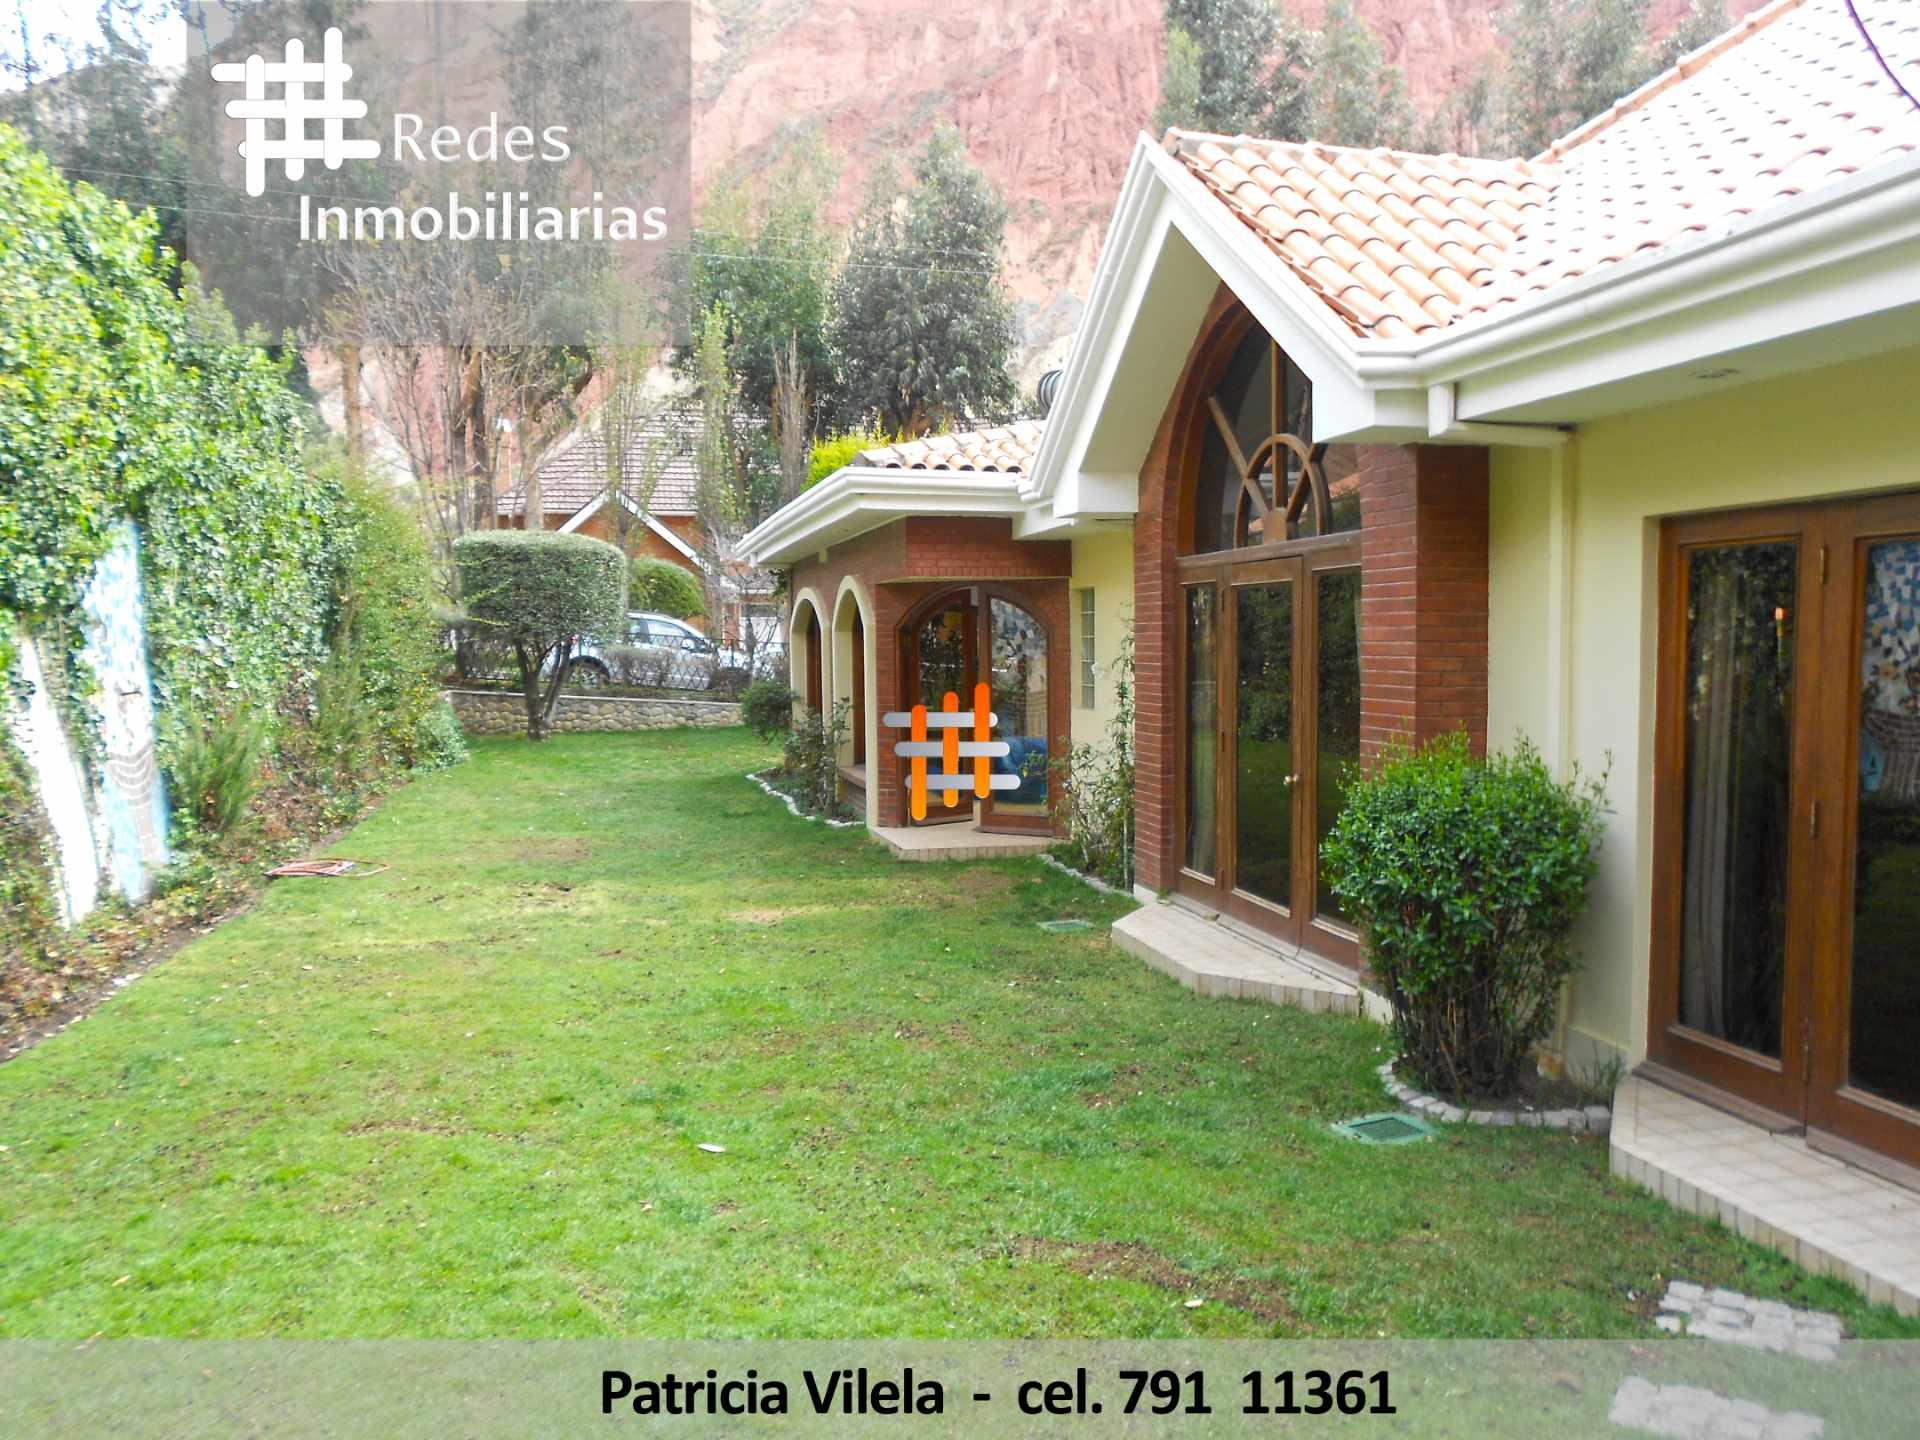 Casa en Alquiler HERMOSA RESIDENCIA EN ALQUILER  ...ARANJUEZ Foto 4